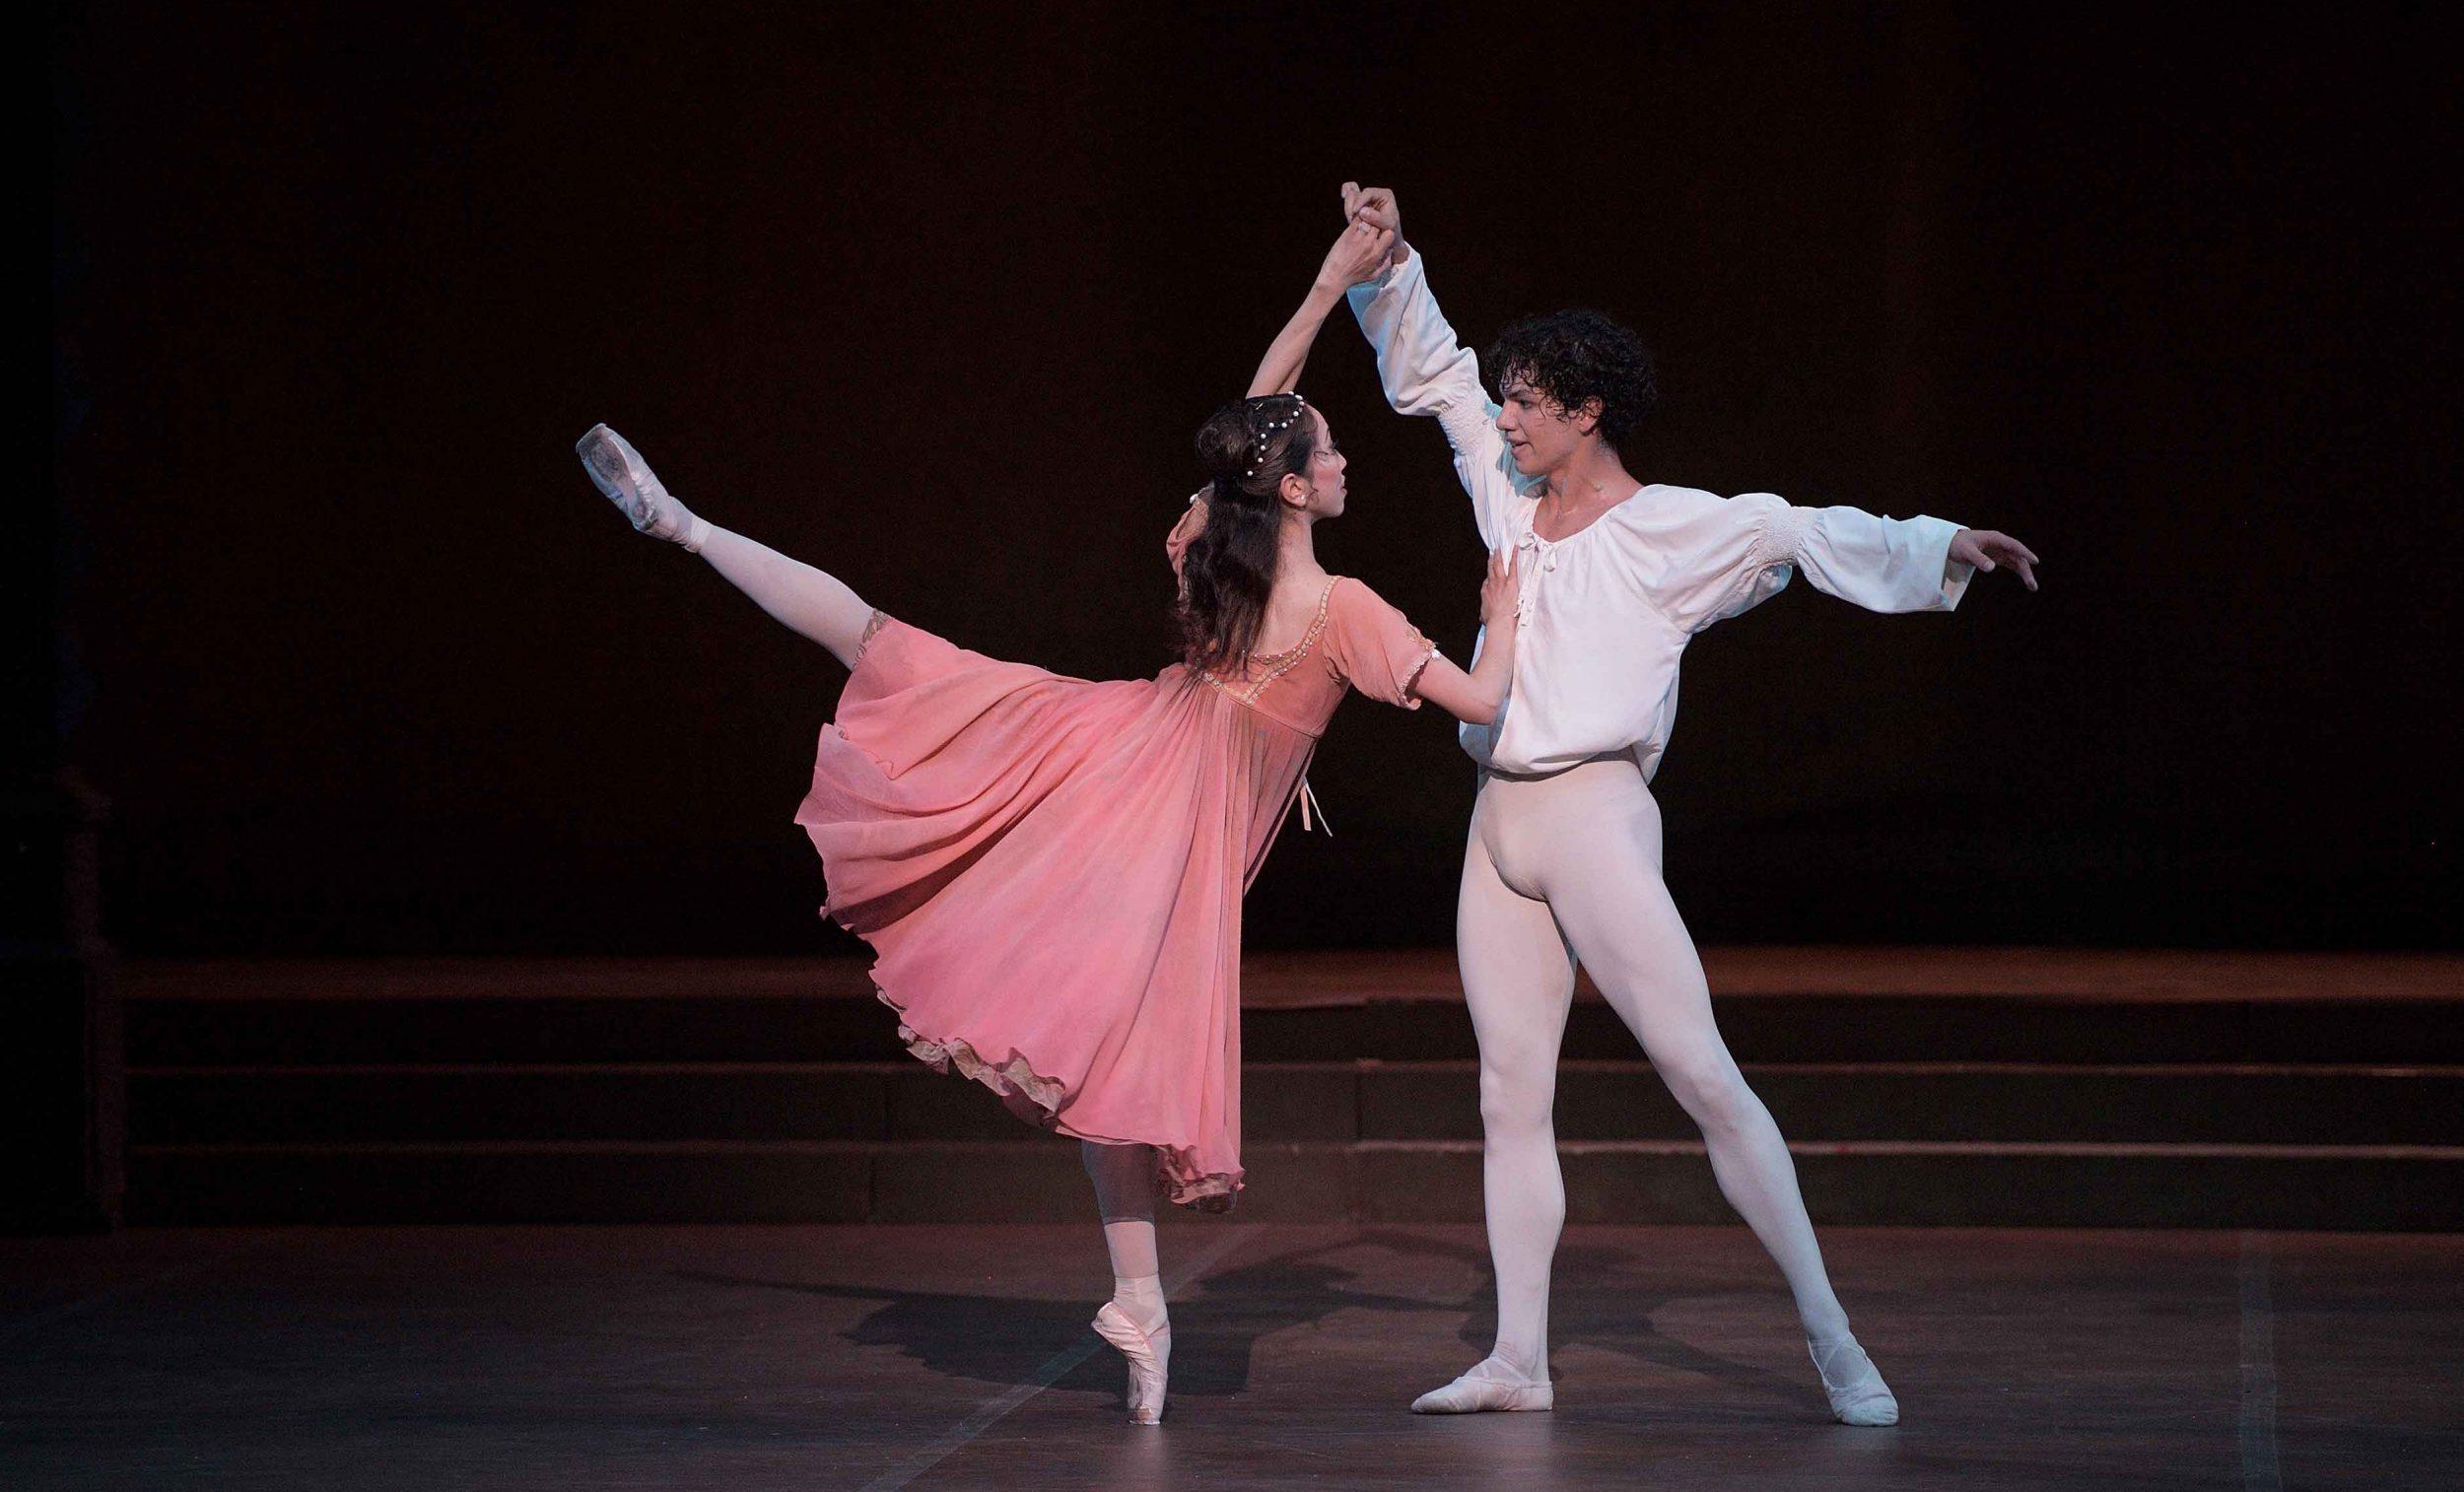 Erina-Takahashi-as-Juliet-and-Isaac-Hernandez-as-Romeo-in-Romeo-&-Juliet-©-Laurent-Liotardo-(2)